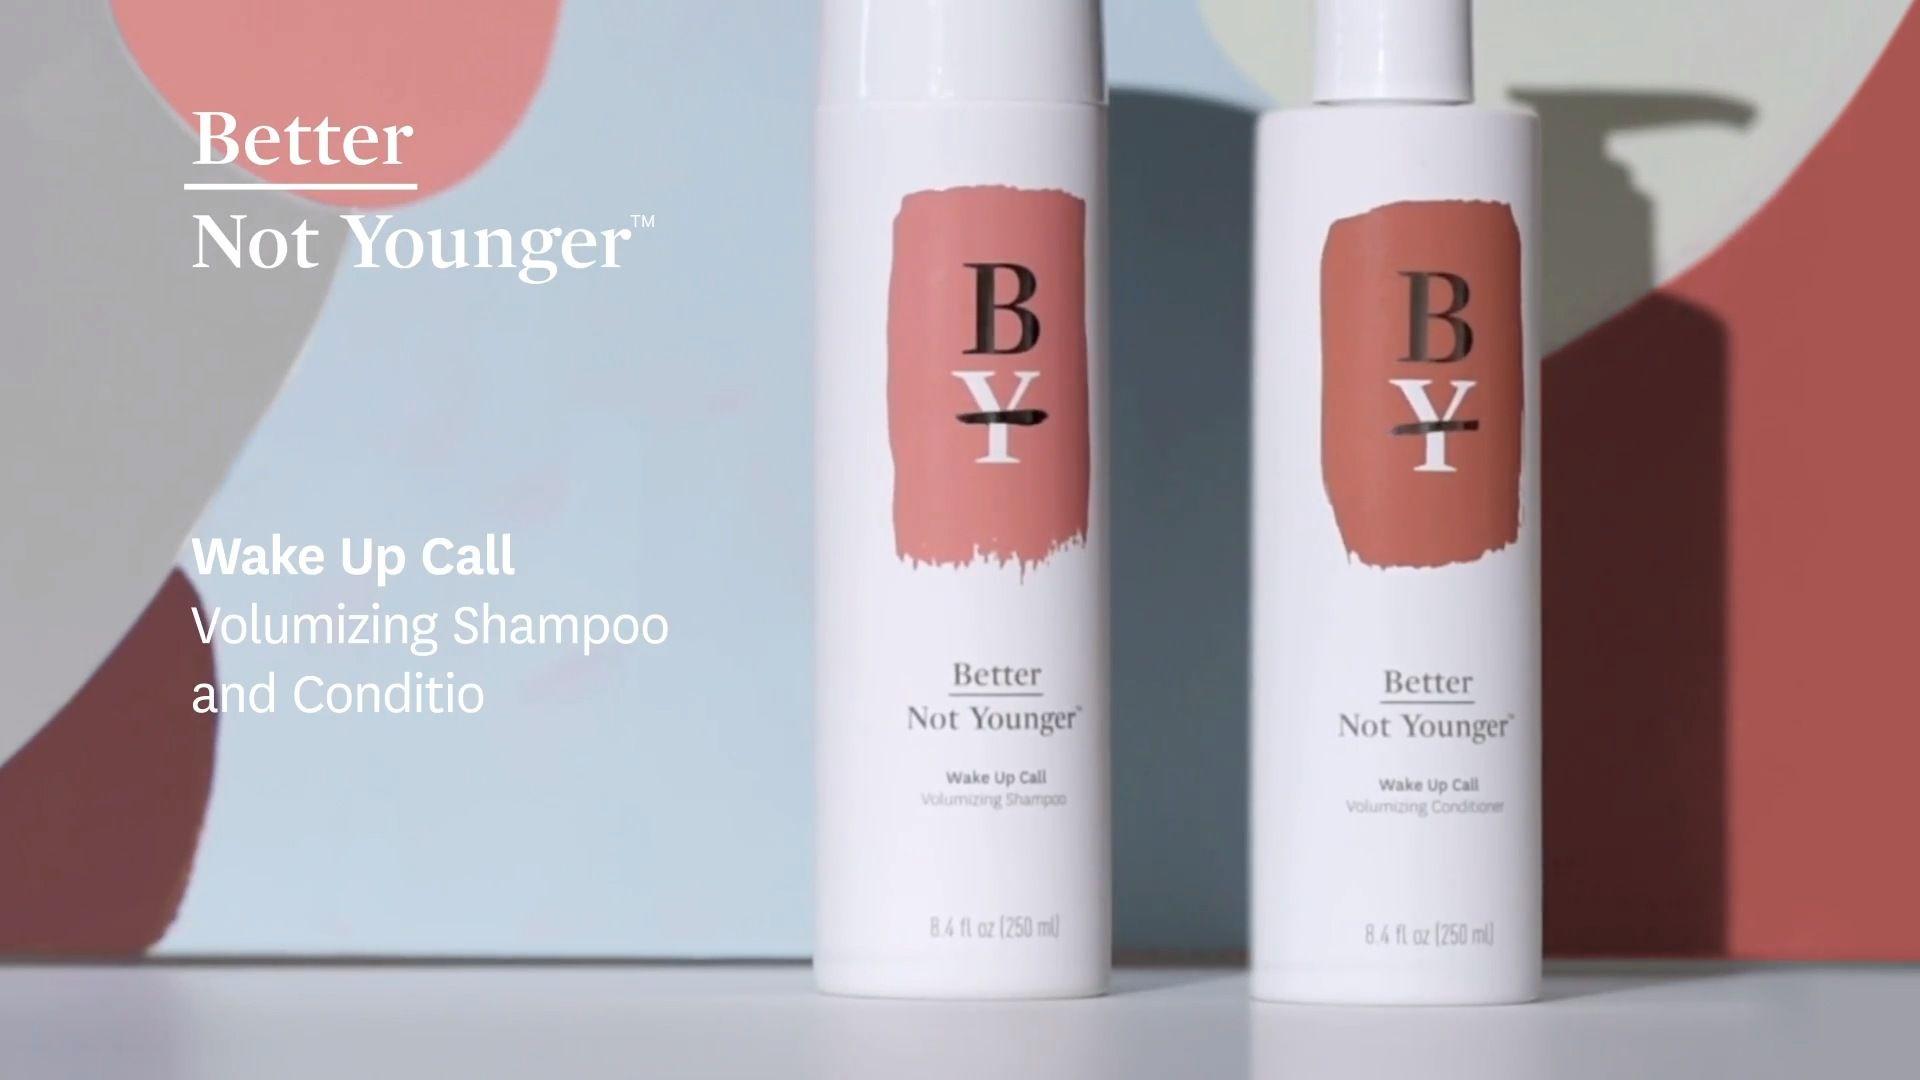 Wake Up Call Volumizing Shampoo - Better Not Younger   Sephora